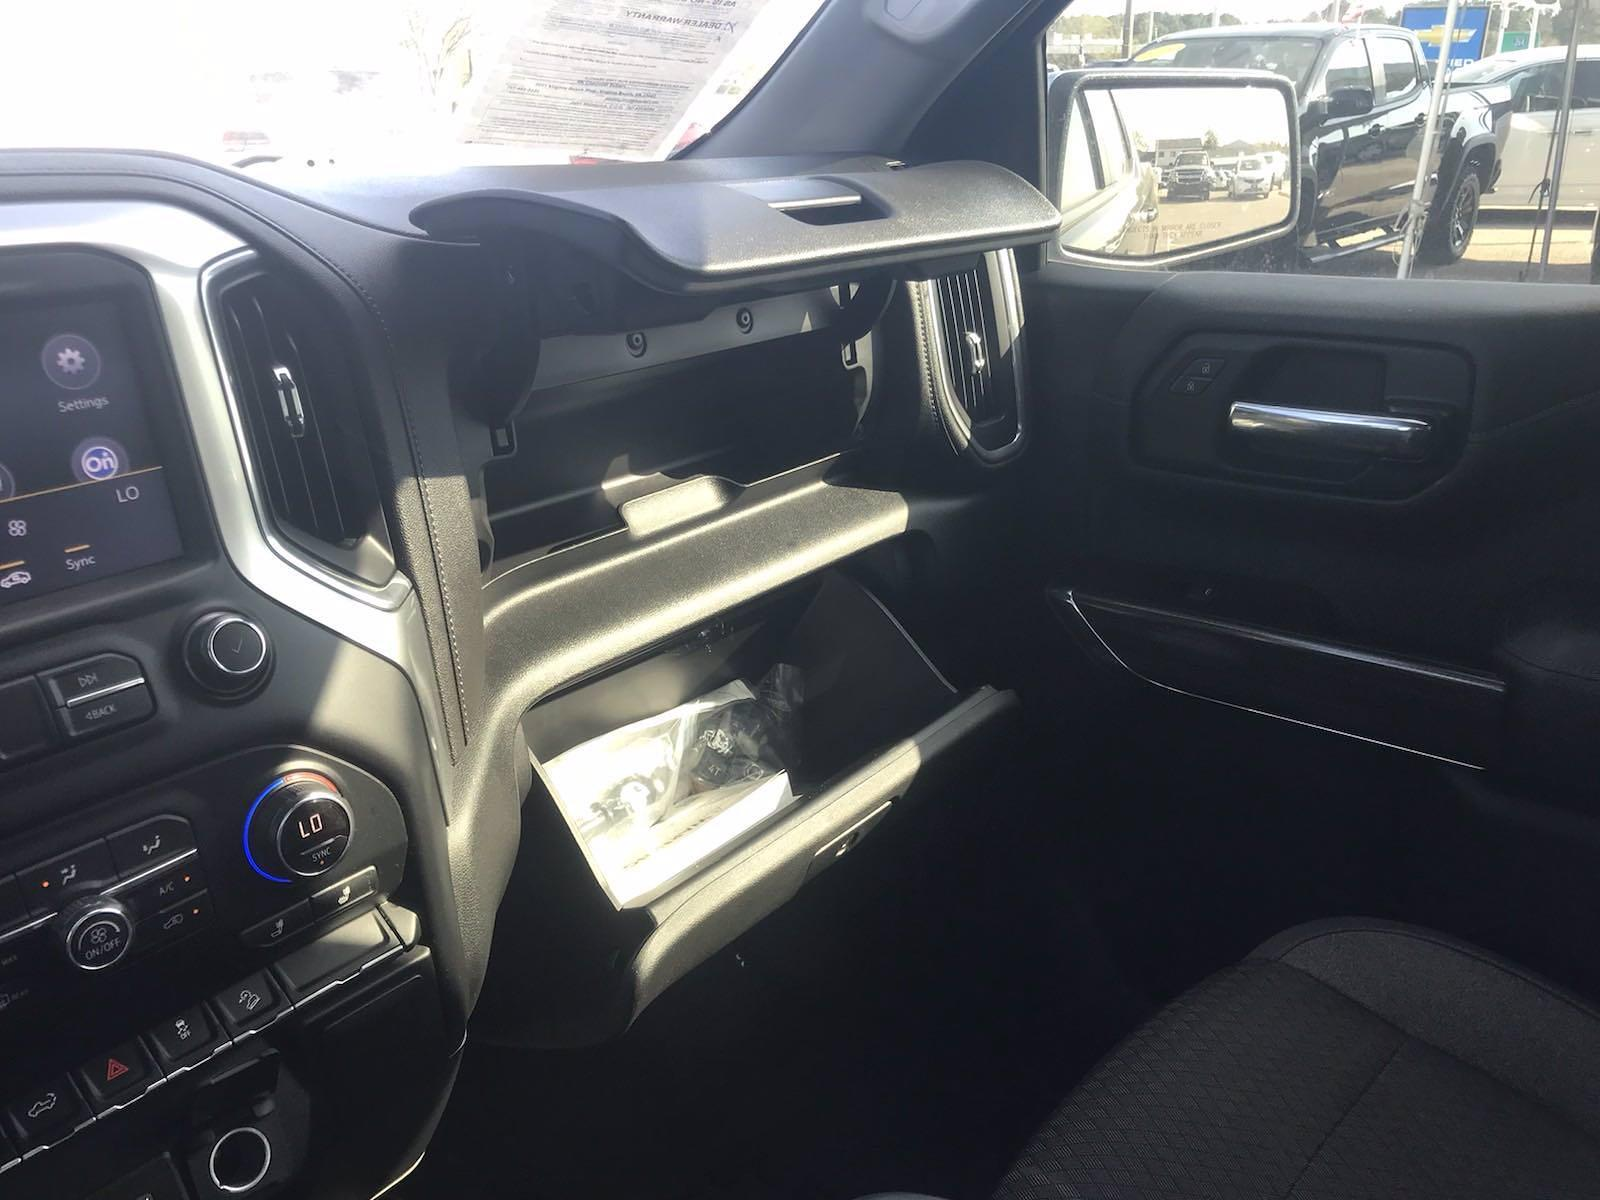 2019 Chevrolet Silverado 1500 Crew Cab 4x4, Pickup #16486P - photo 38